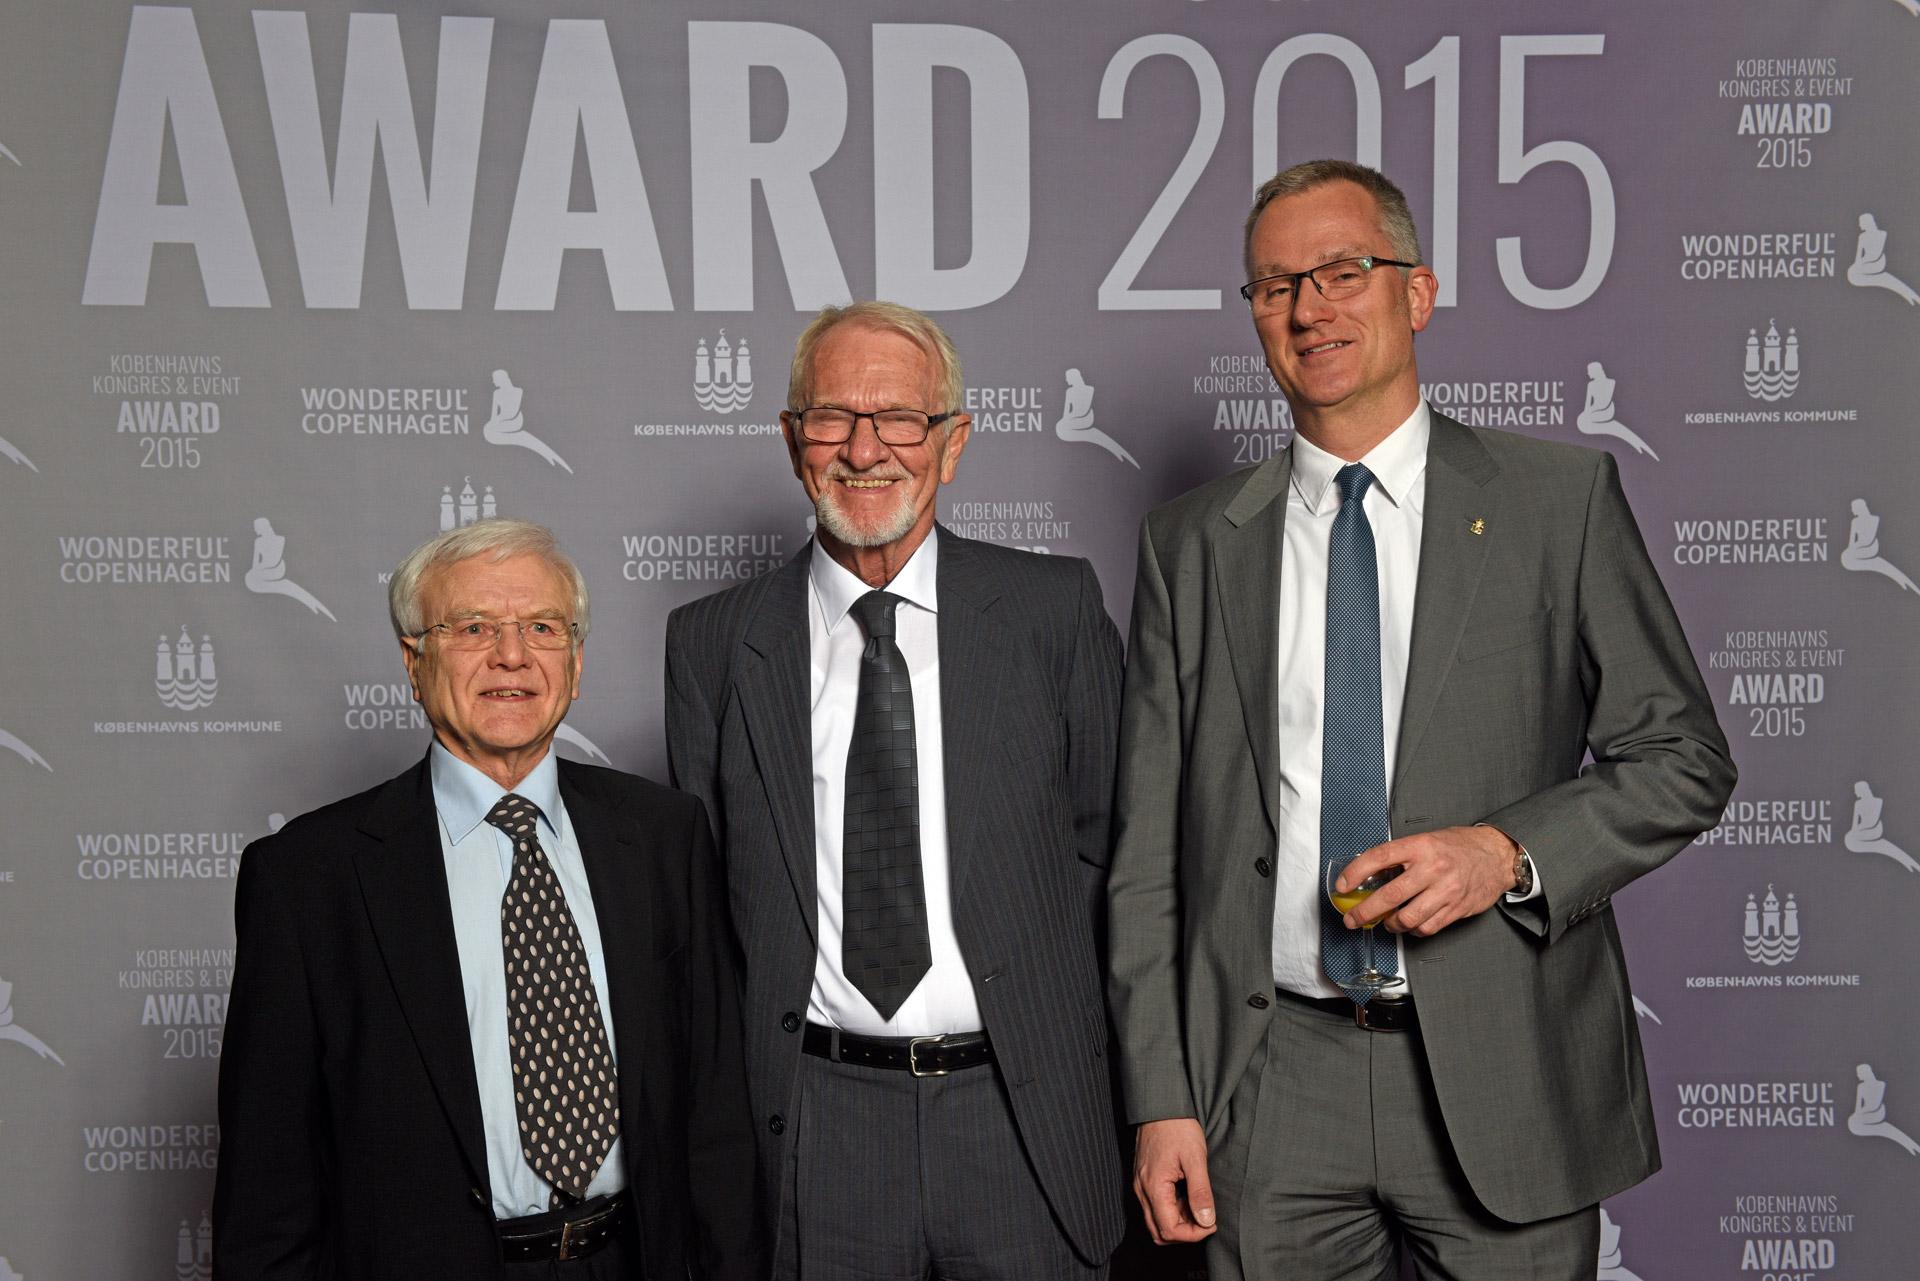 Three men at Wonderful Copenhagen awards 2015